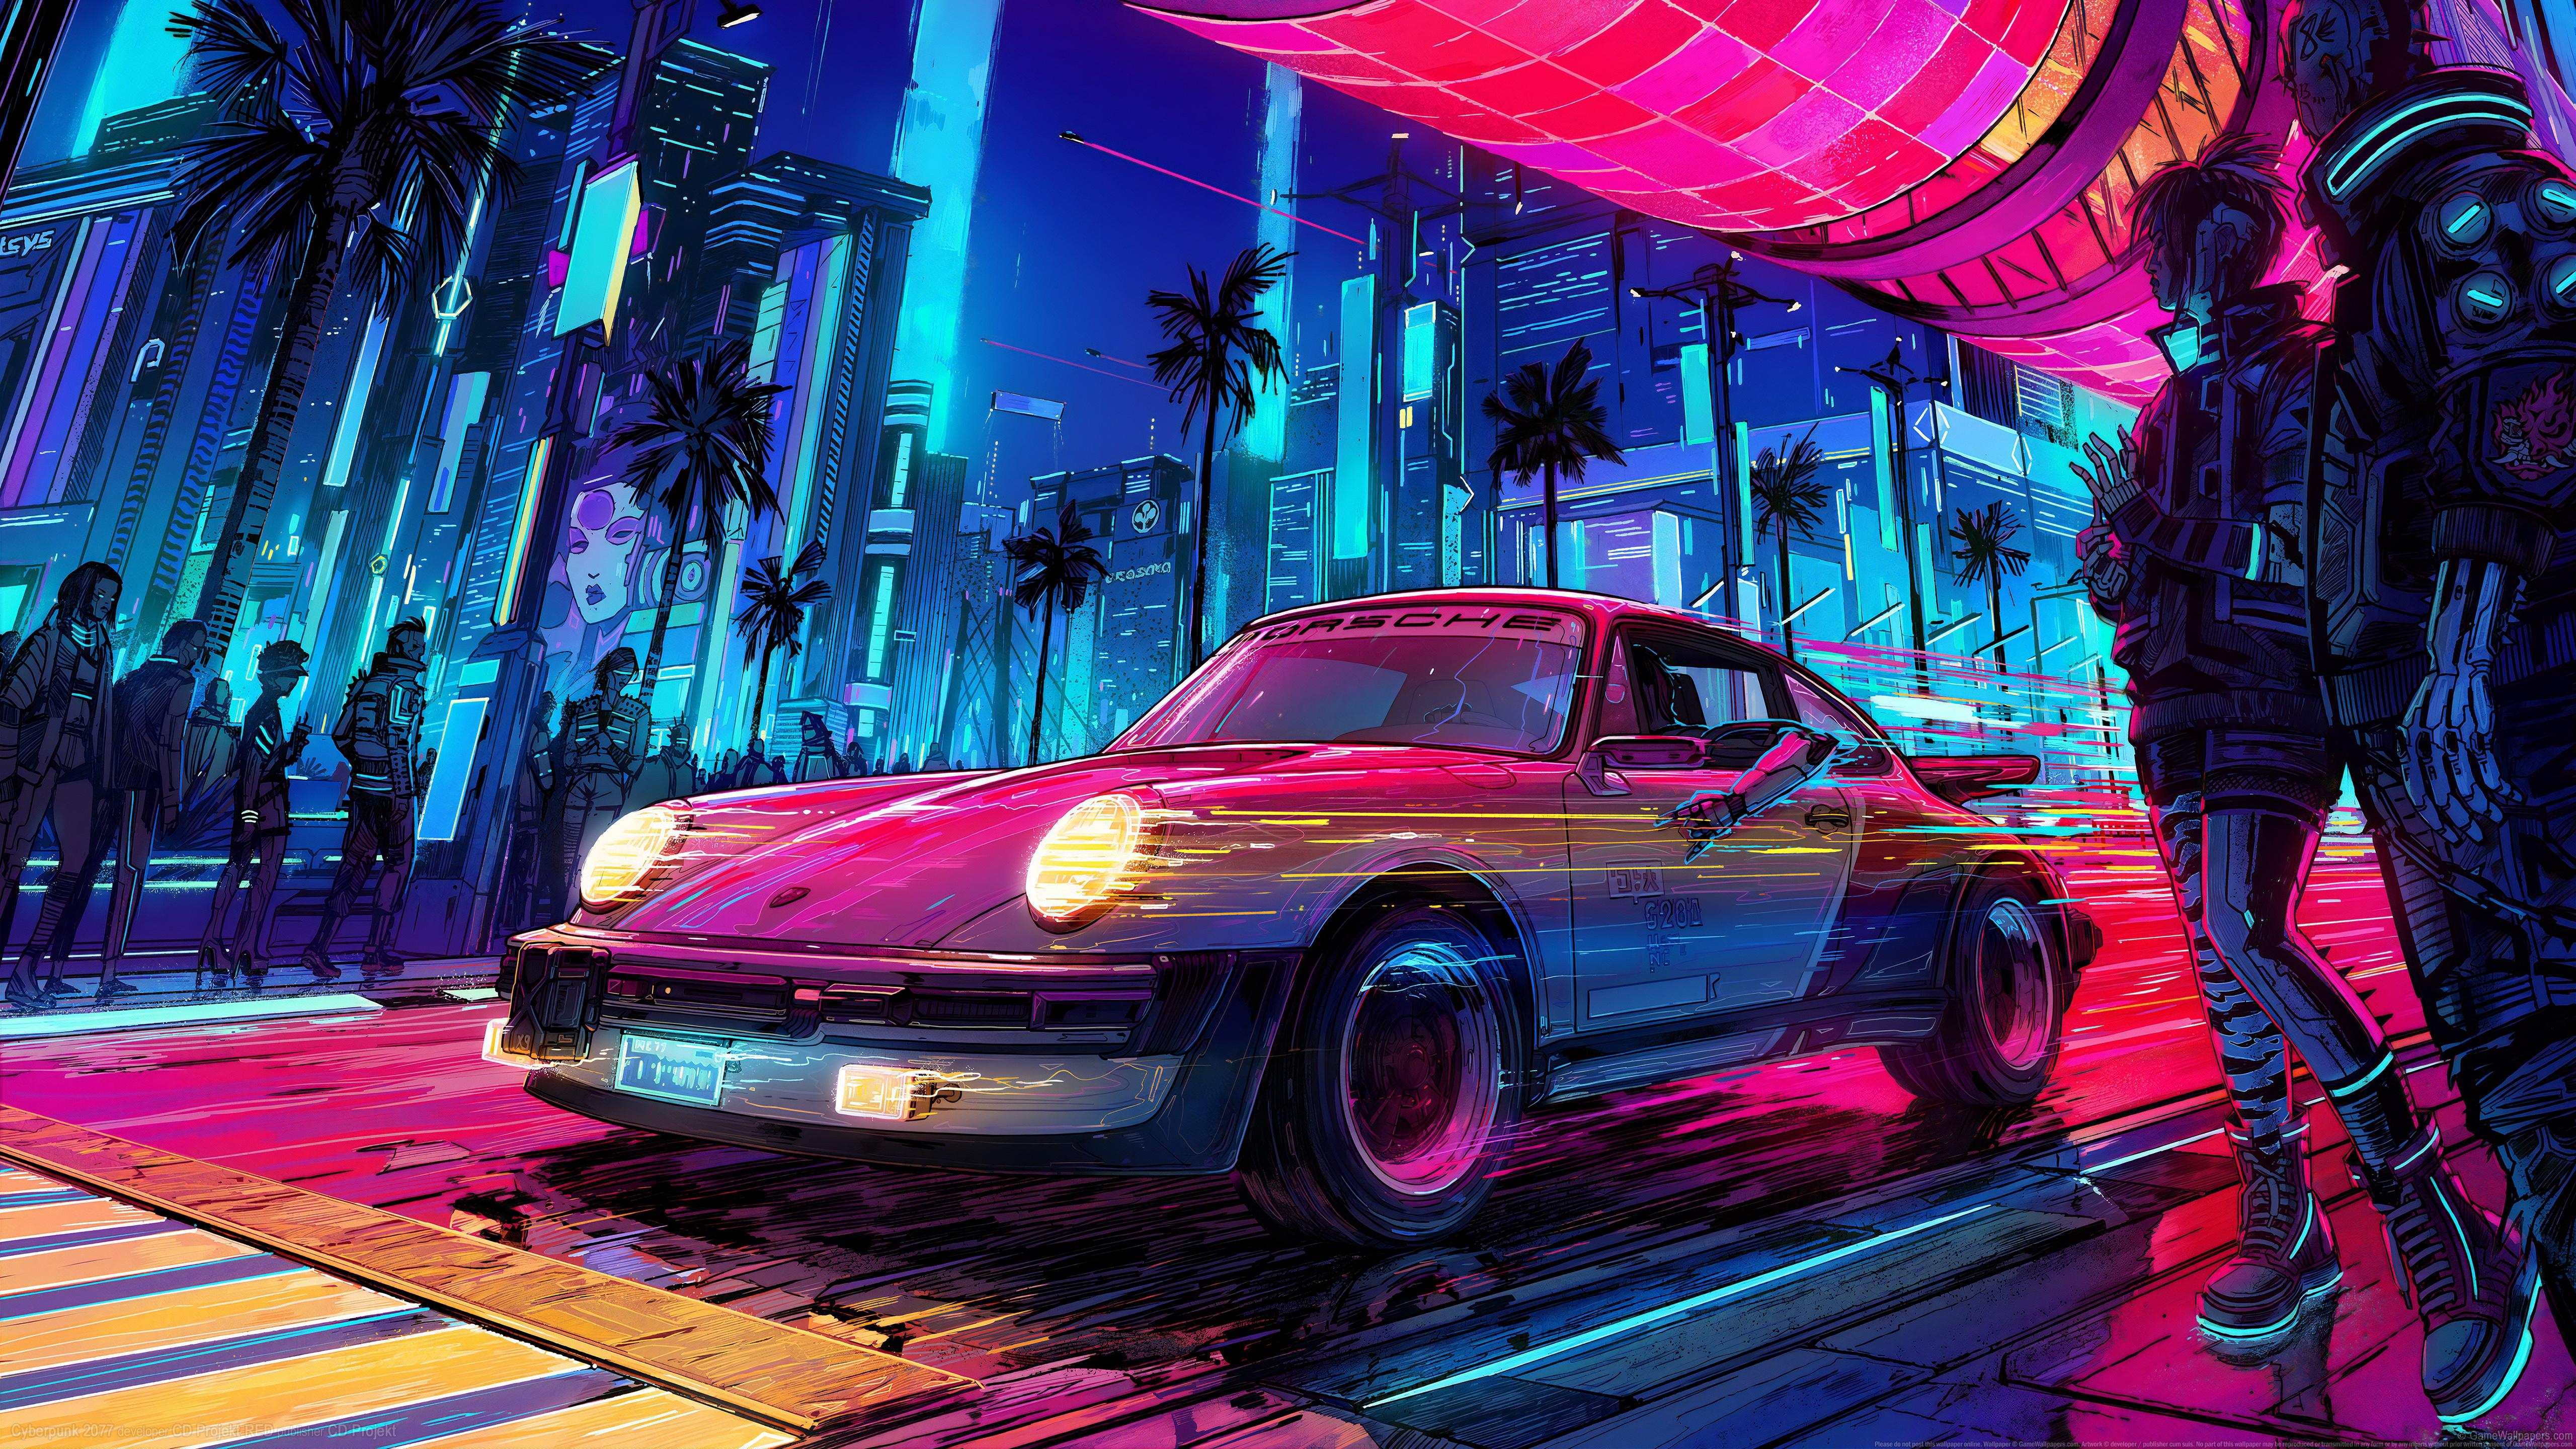 General 5120x2880 video games video game art digital art Porsche Retro car neon cyberpunk Cyberpunk 2077 watermarked